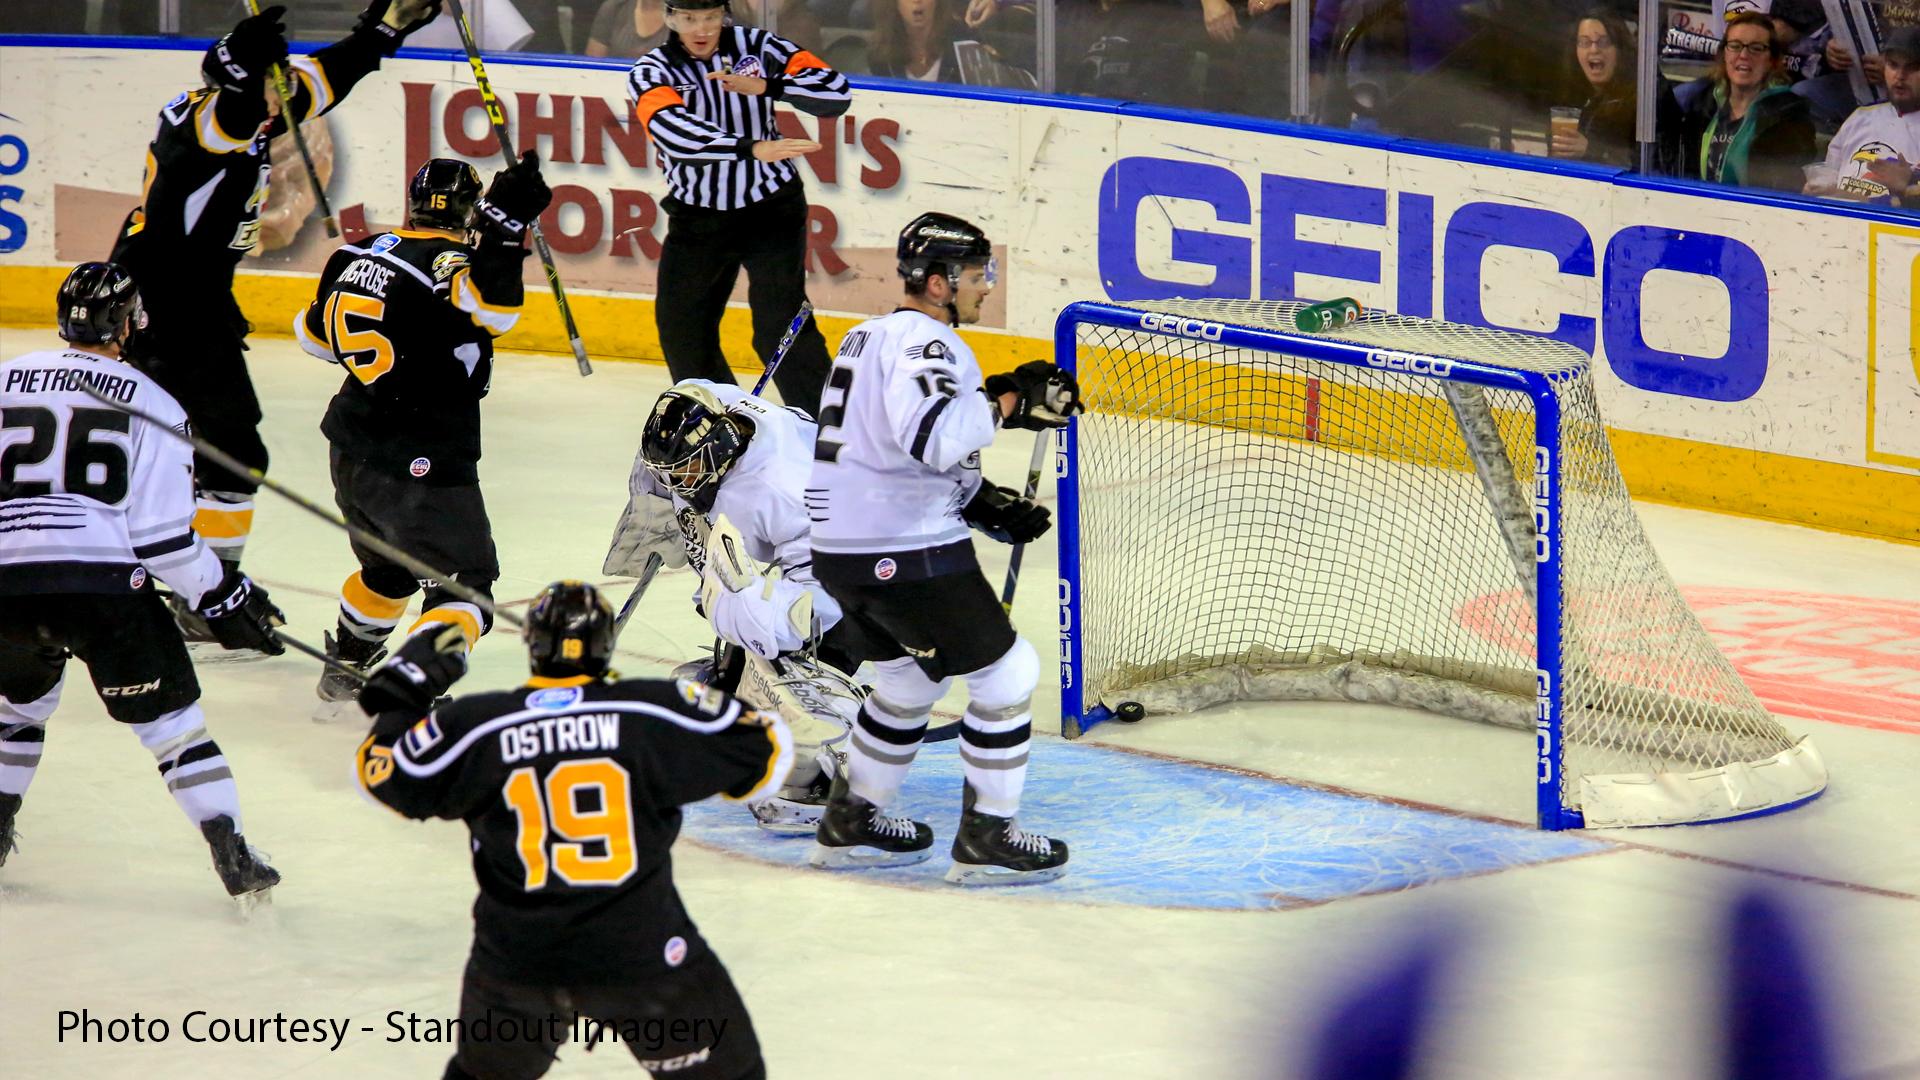 Geico Extends Landmark Agreement with ECHL